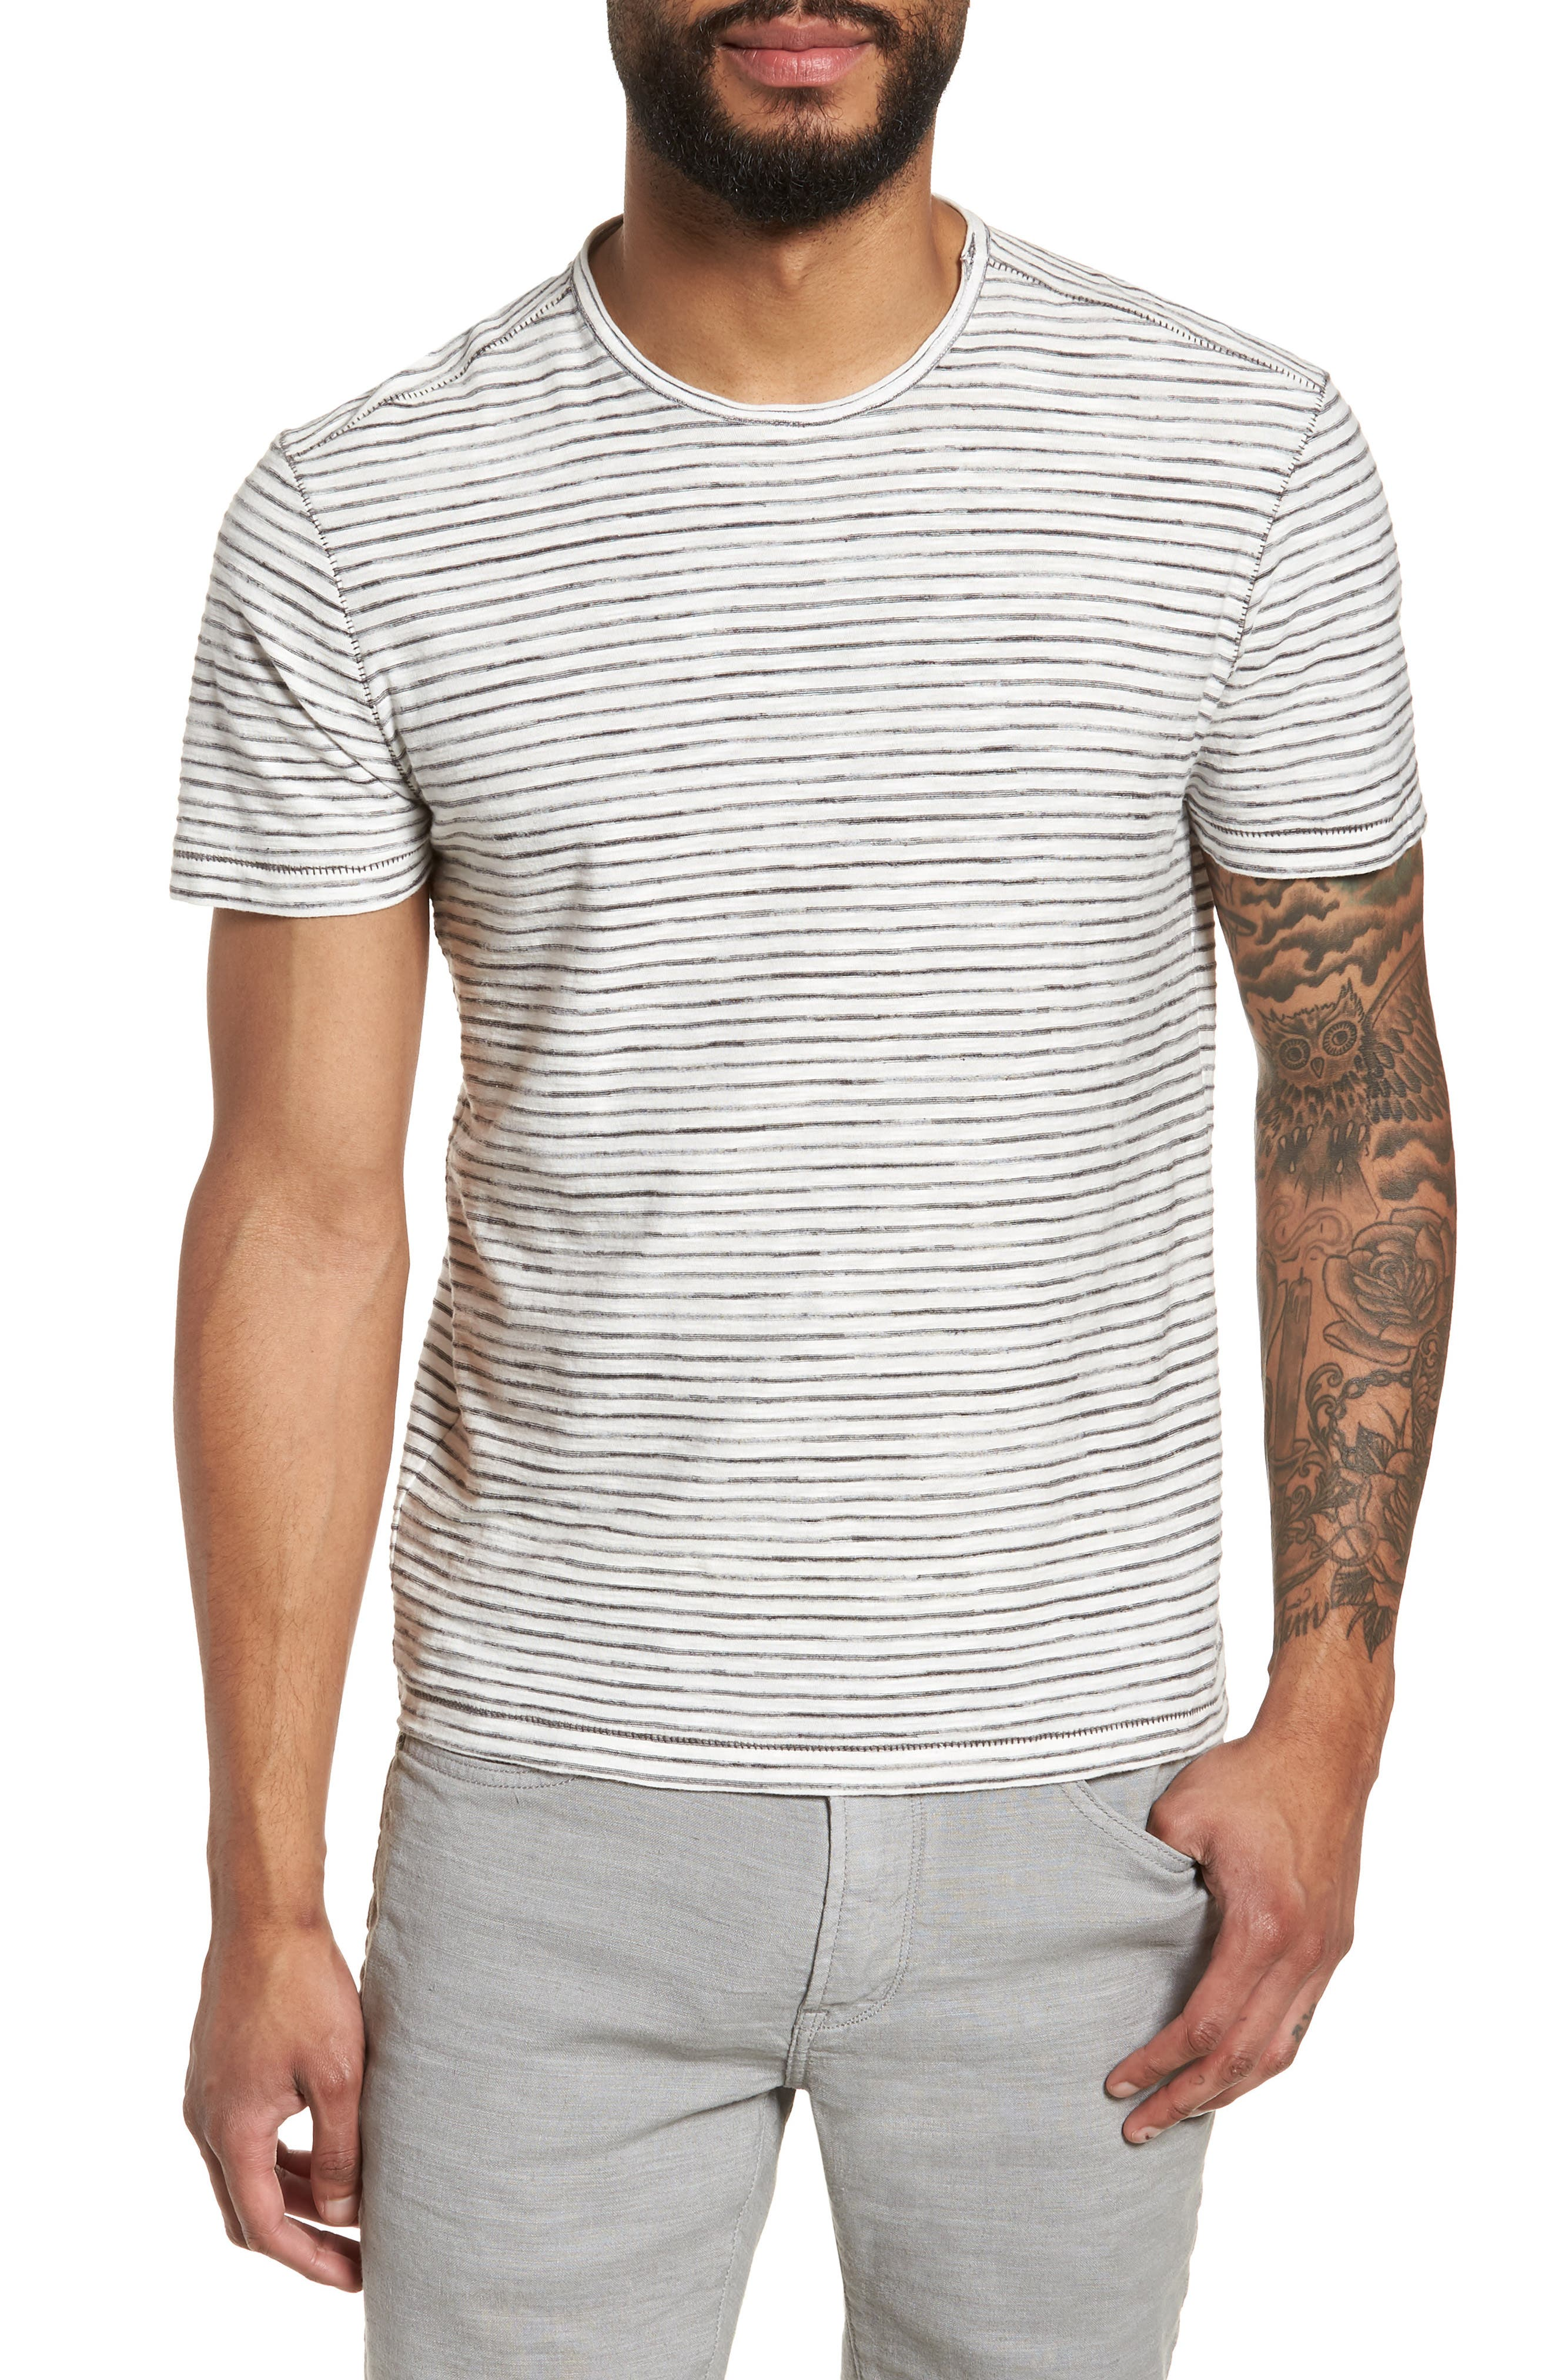 Slim Fit T-Shirt,                             Main thumbnail 1, color,                             White